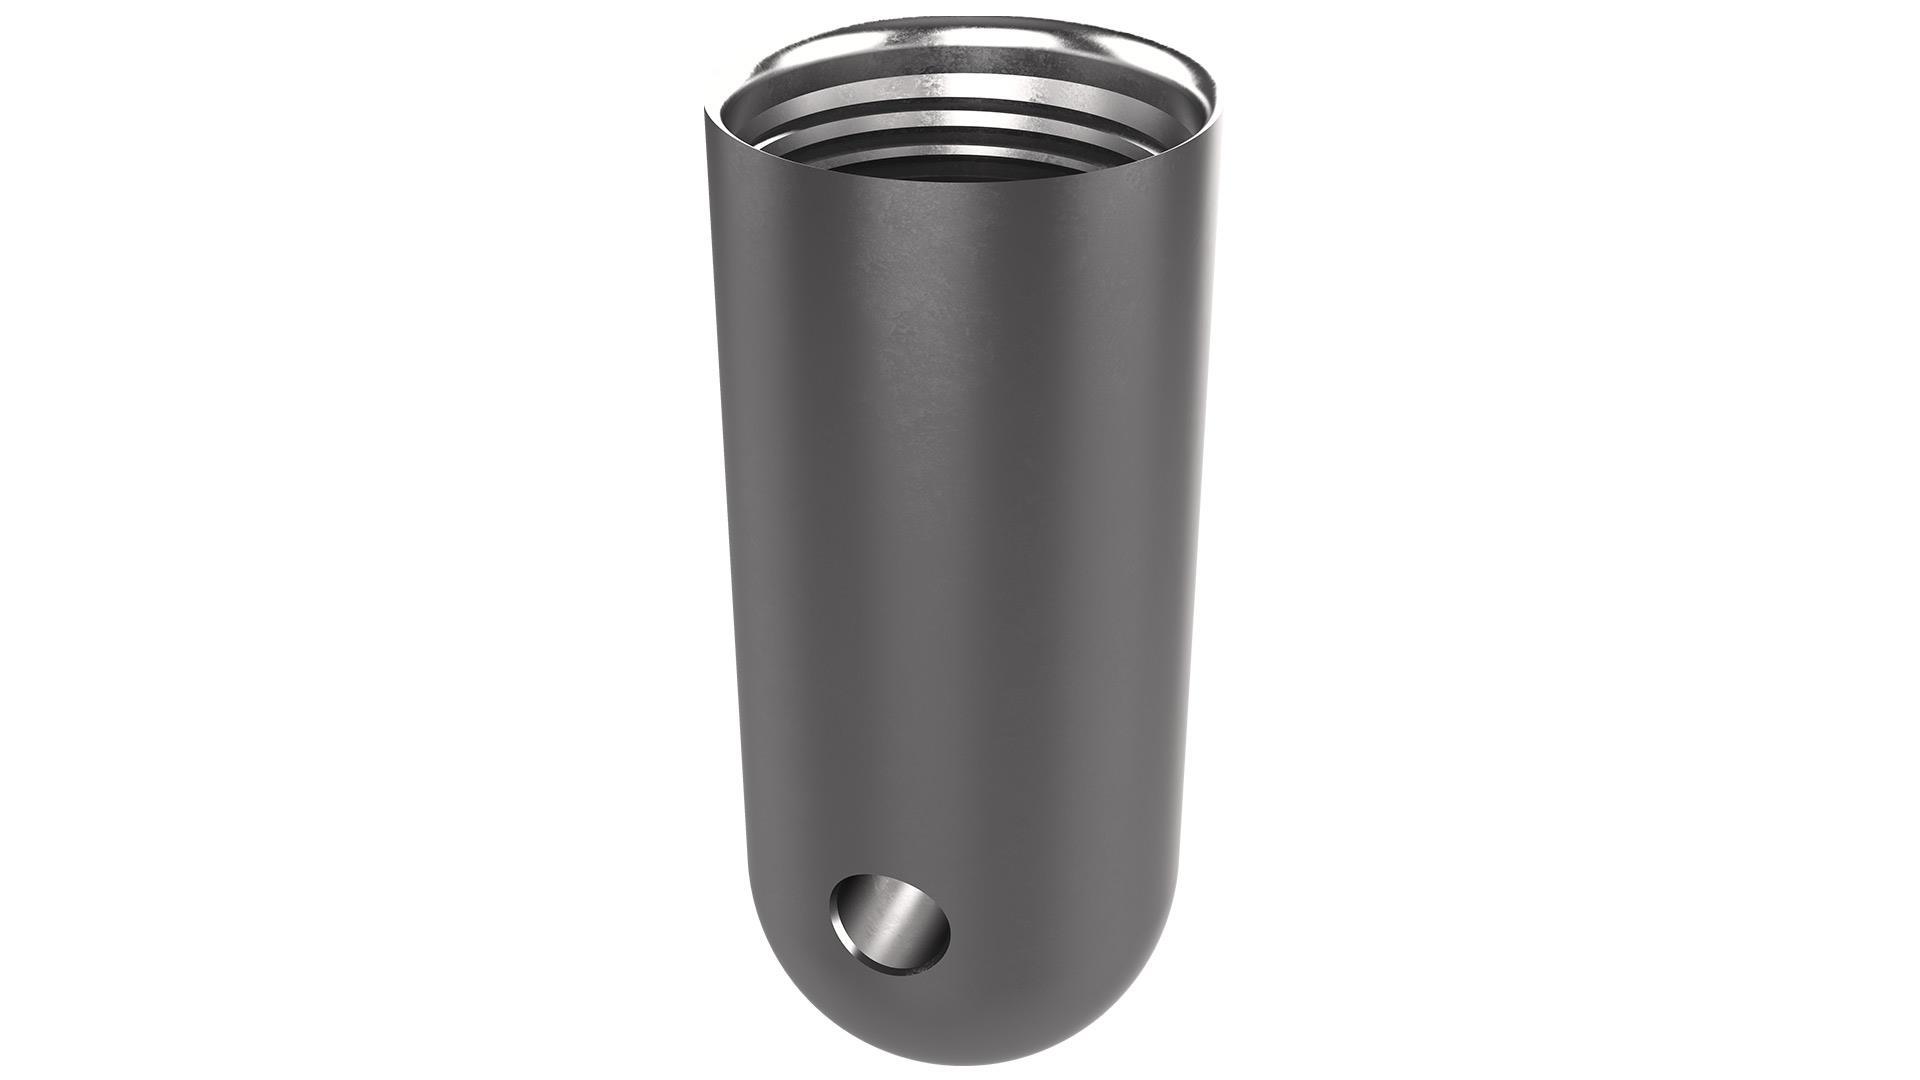 A render of a Hercules Bullet